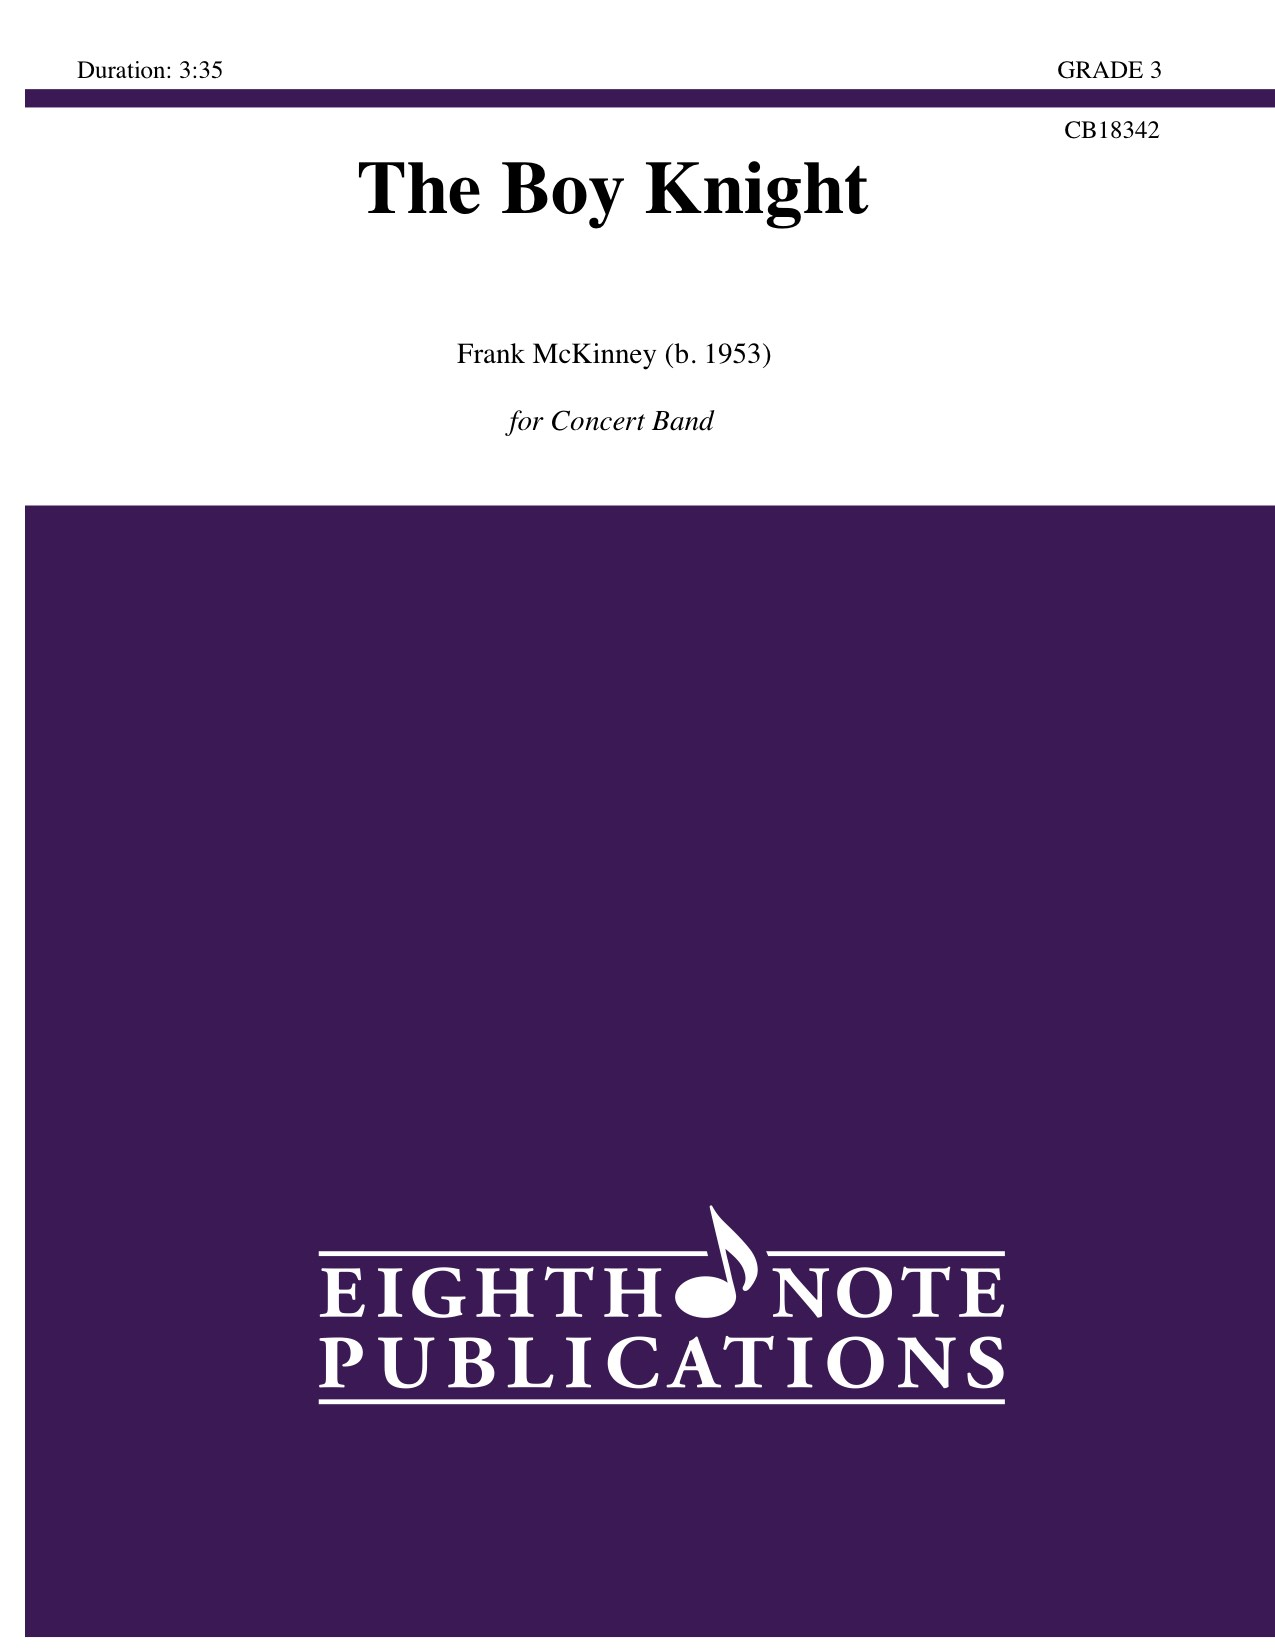 Boy Knight, The - Frank McKinney